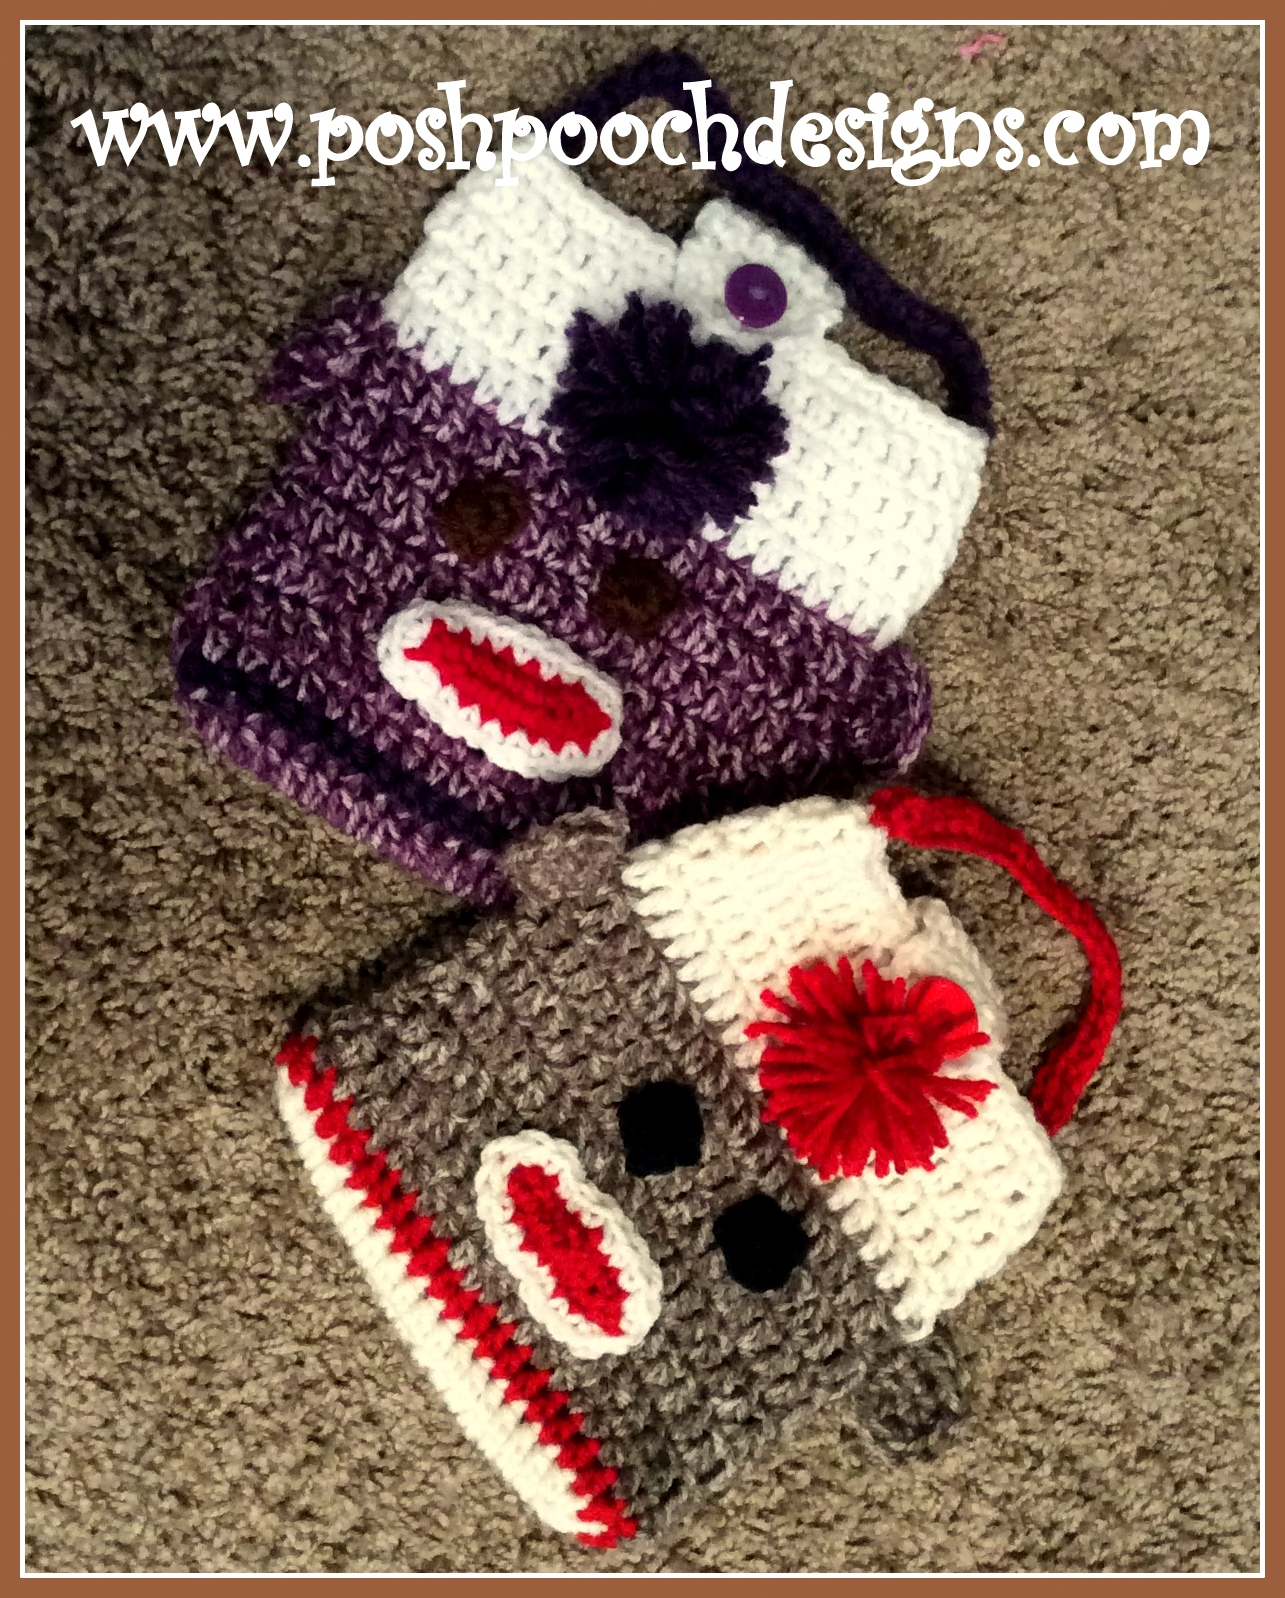 Posh Pooch Designs Dog Clothes Sock Monkey Purse Or Lunch Bag